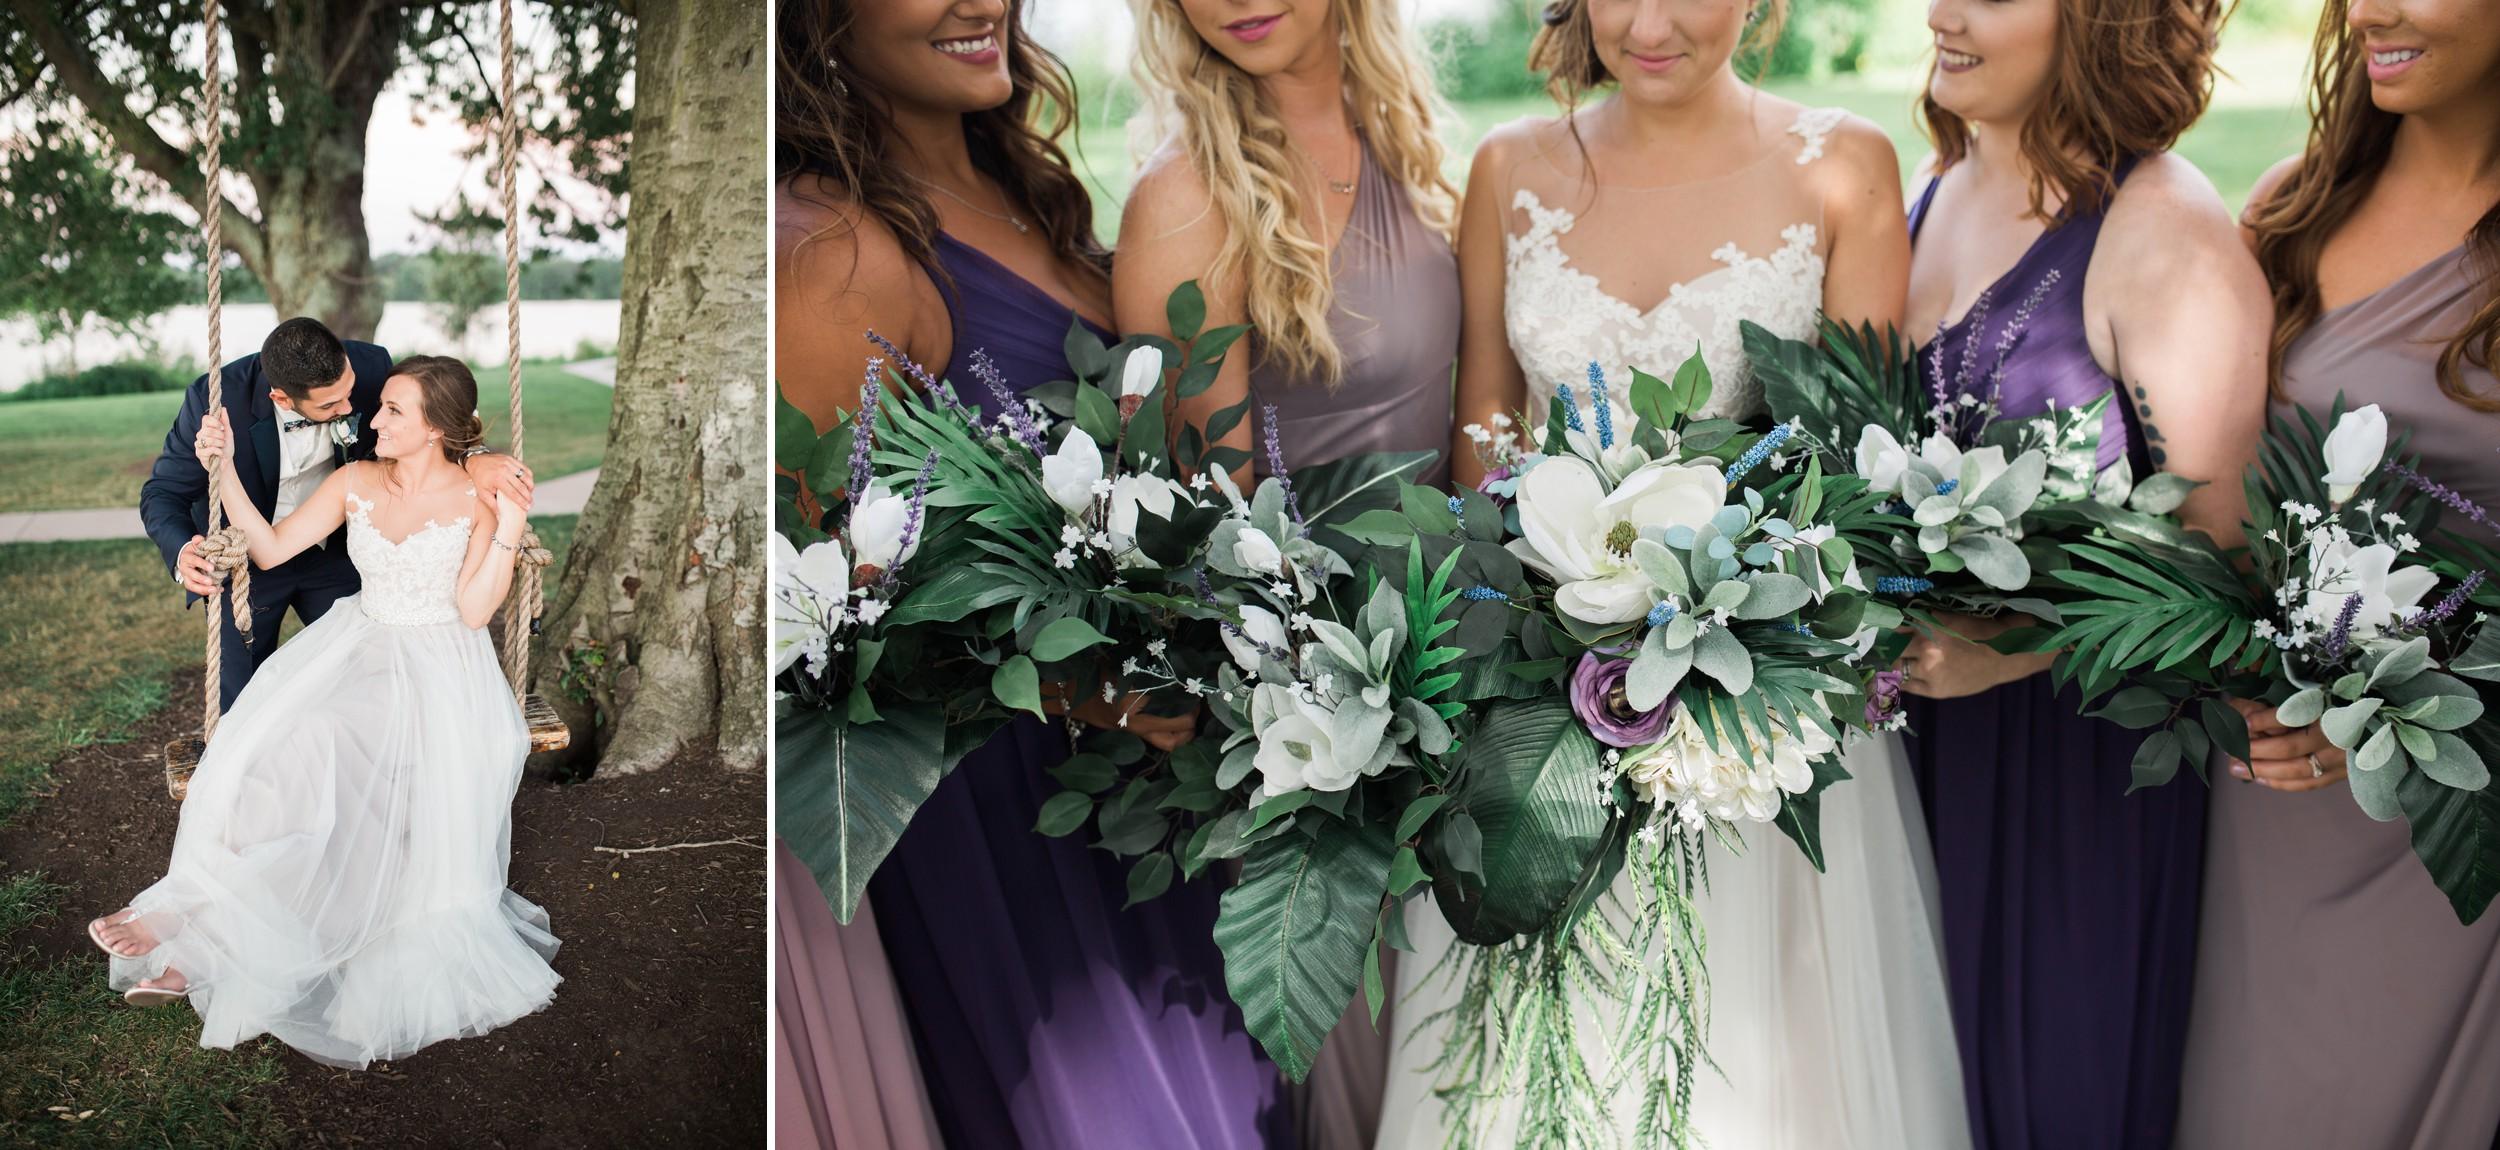 Nick-and-martina-pinelake-vinyards-wedding-columbiana-ohio-tracylynn-photography 18.jpg